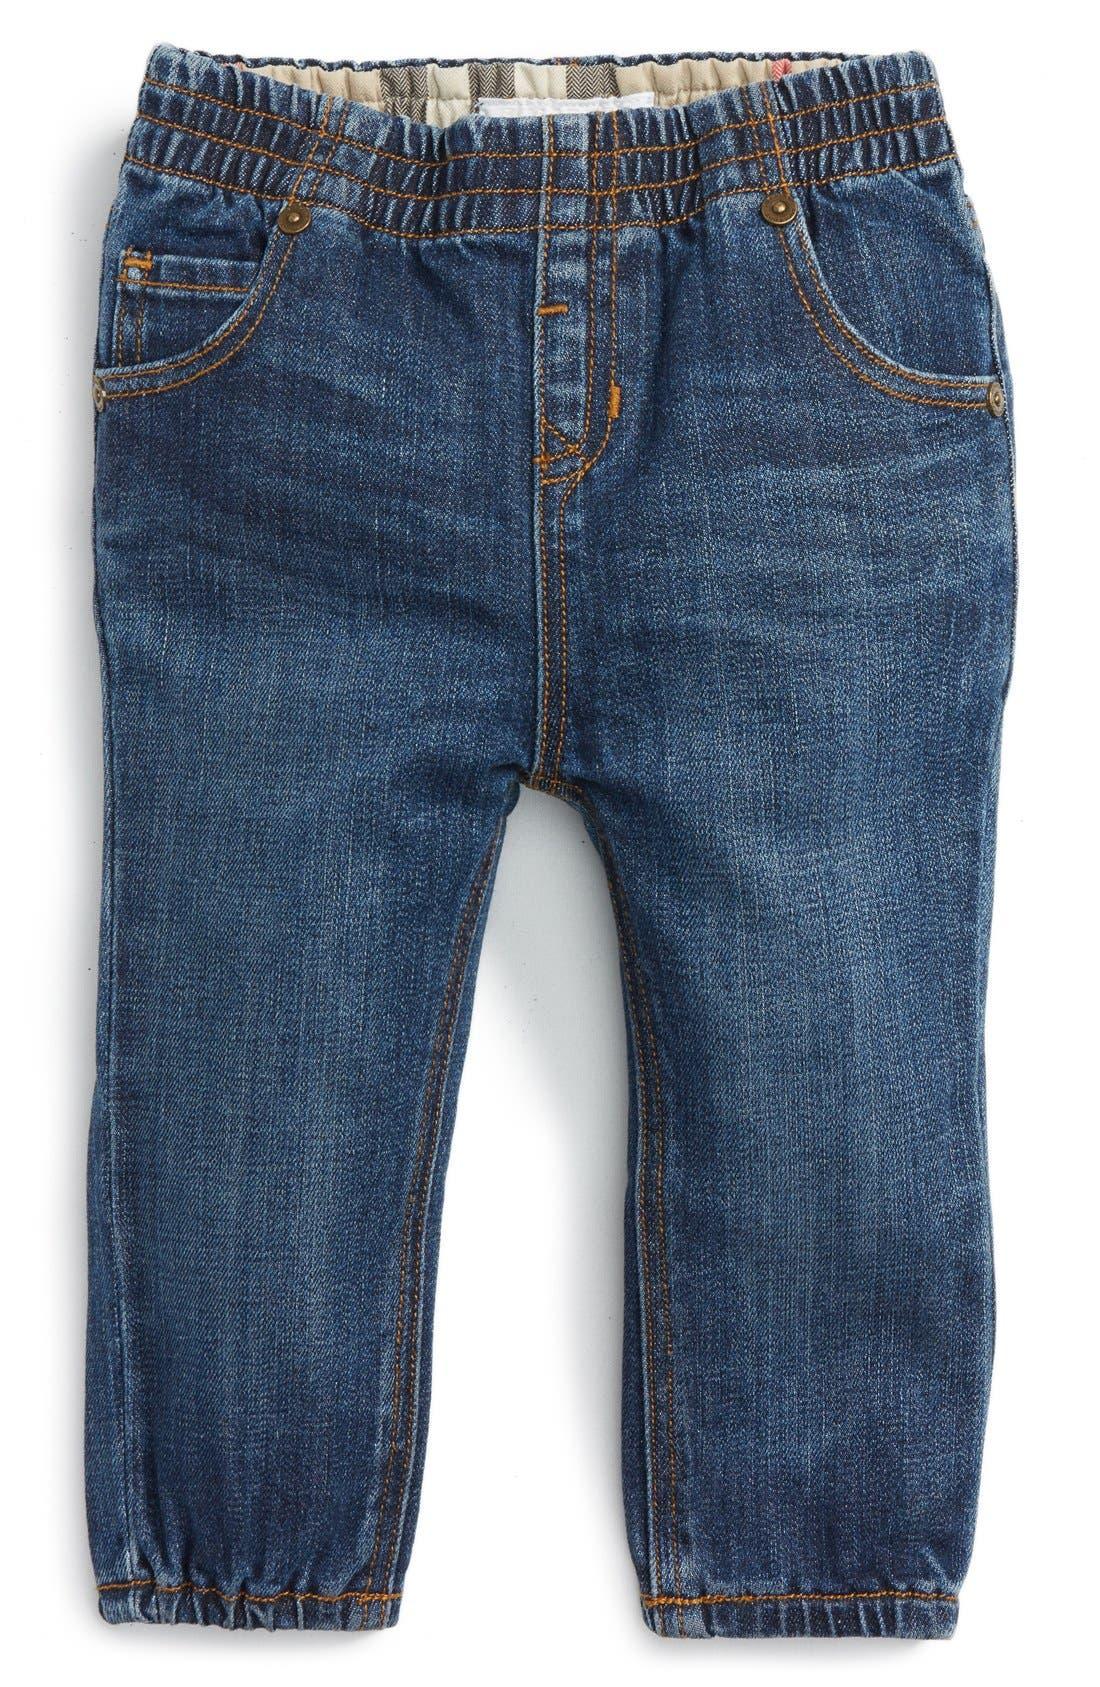 Alternate Image 1 Selected - Burberry Eloise Denim Jogger Pants (Baby Girls)